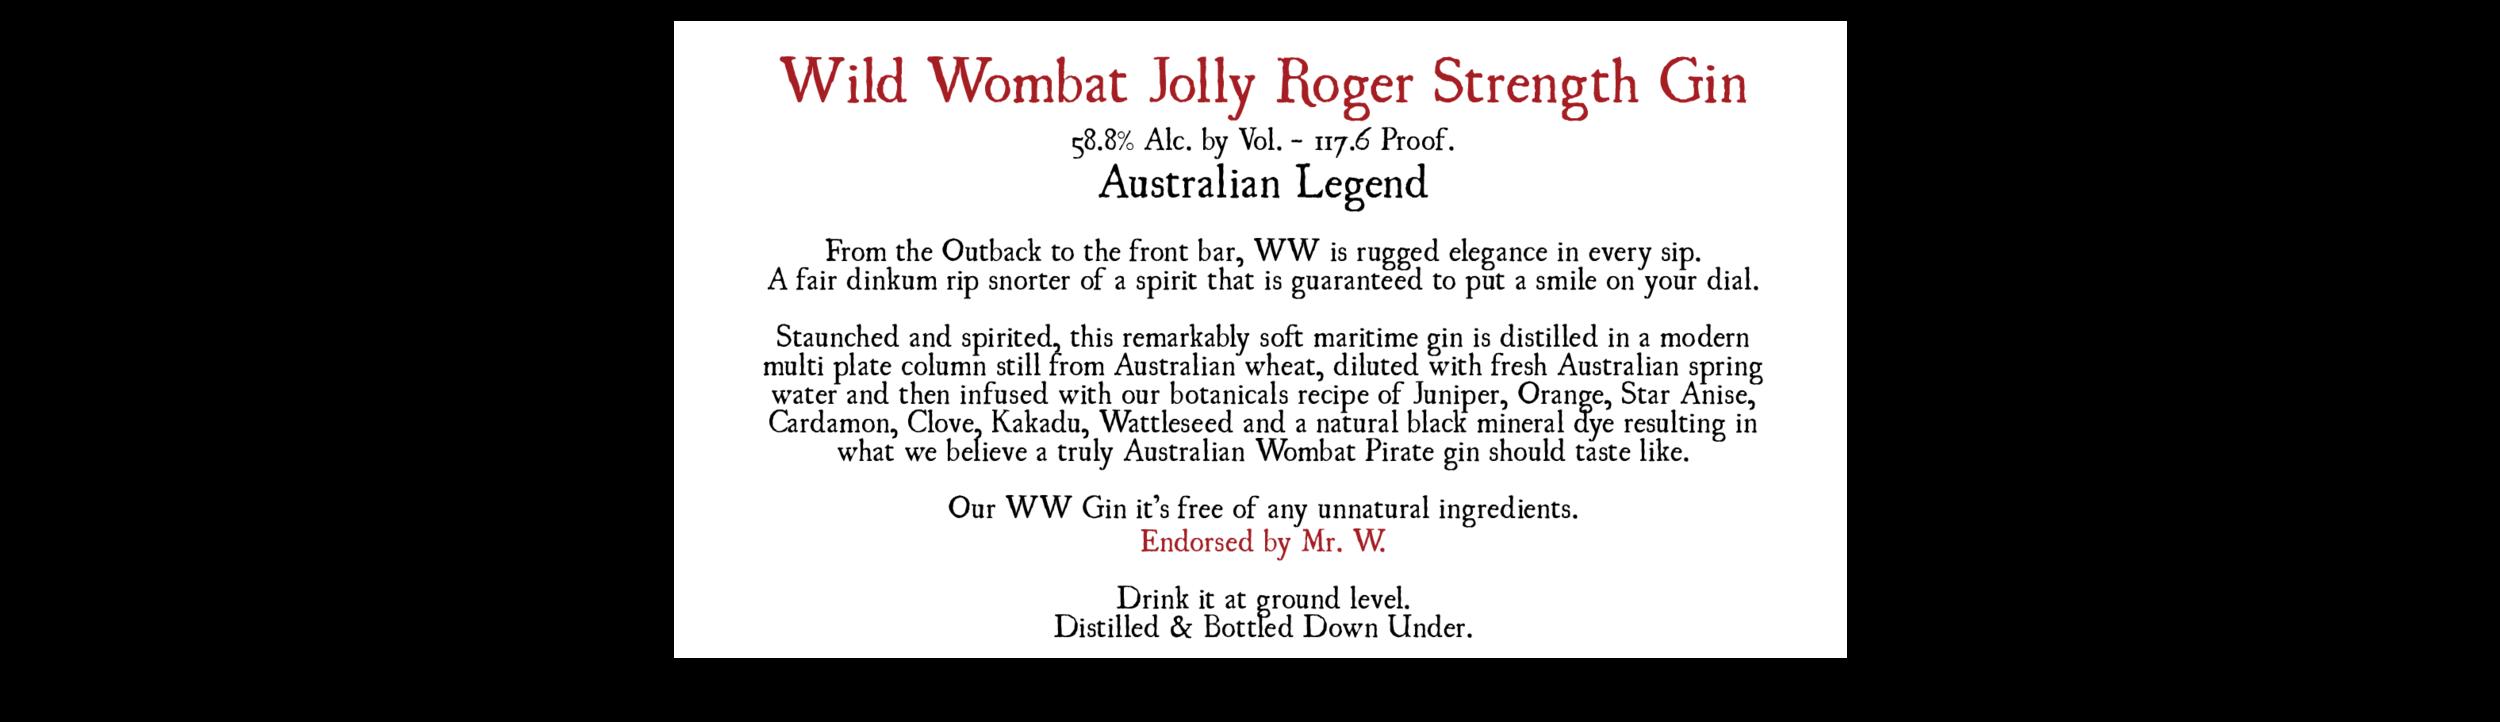 WW jollynew.png